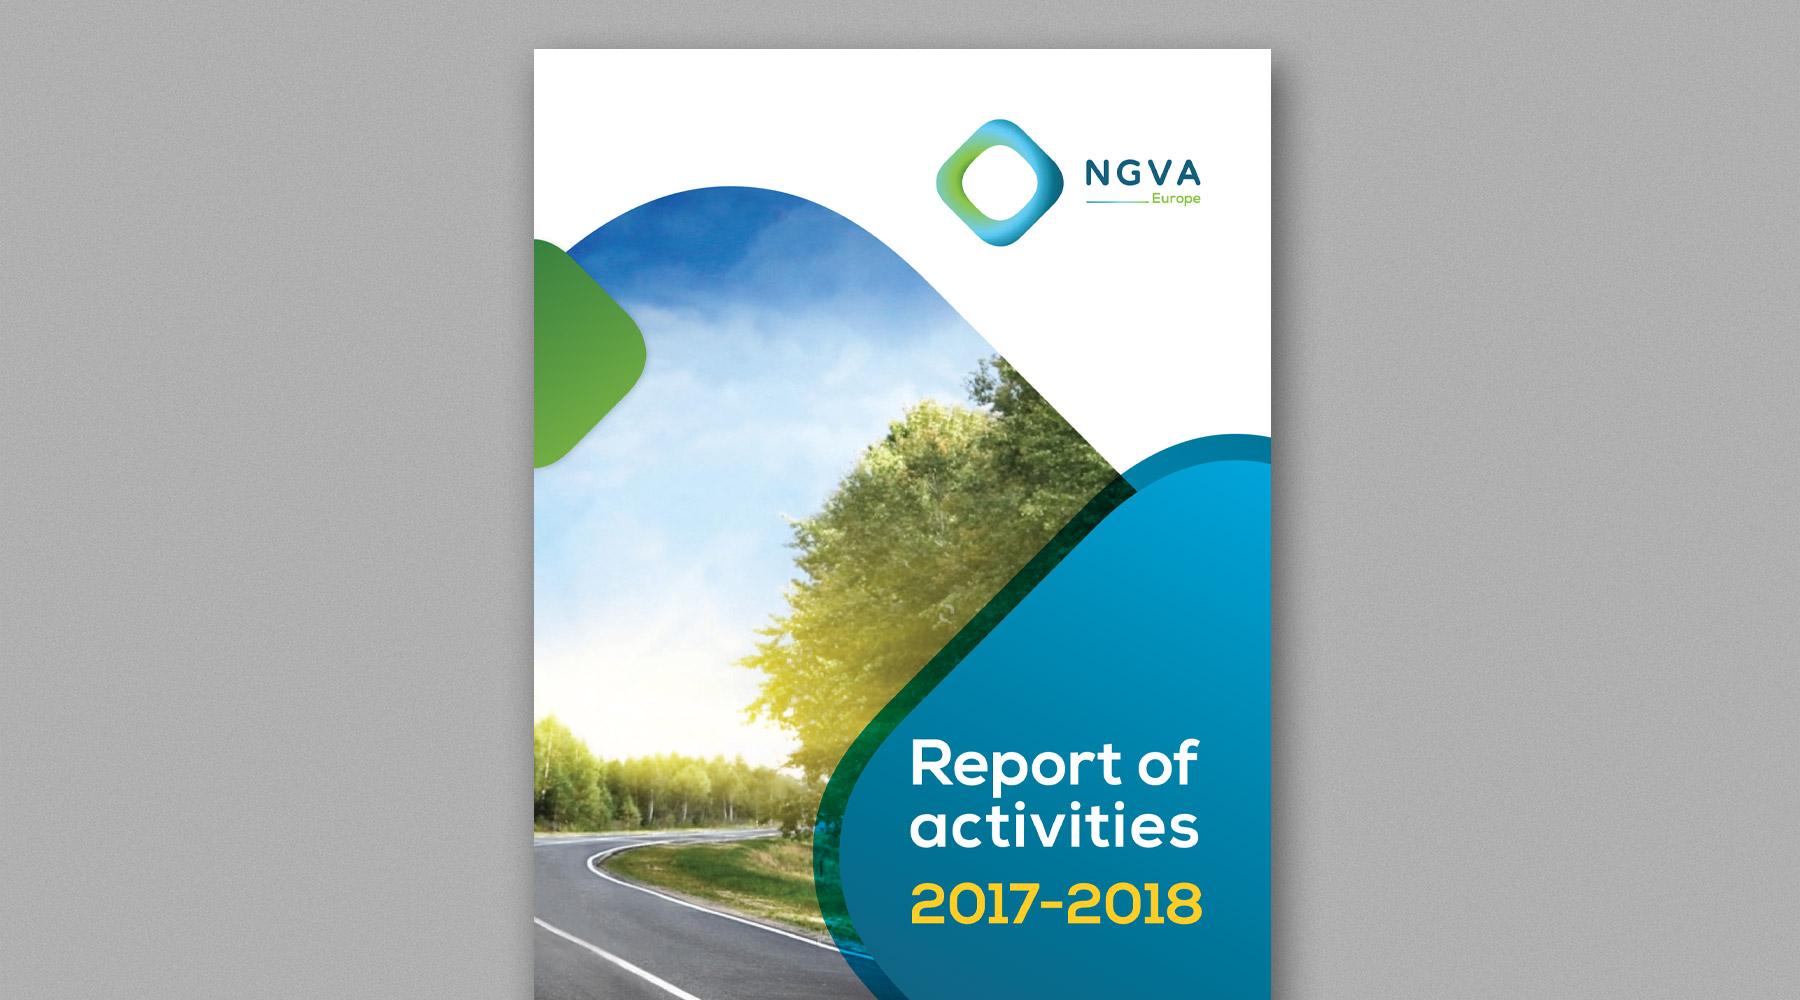 Case Study: NGVA 01B